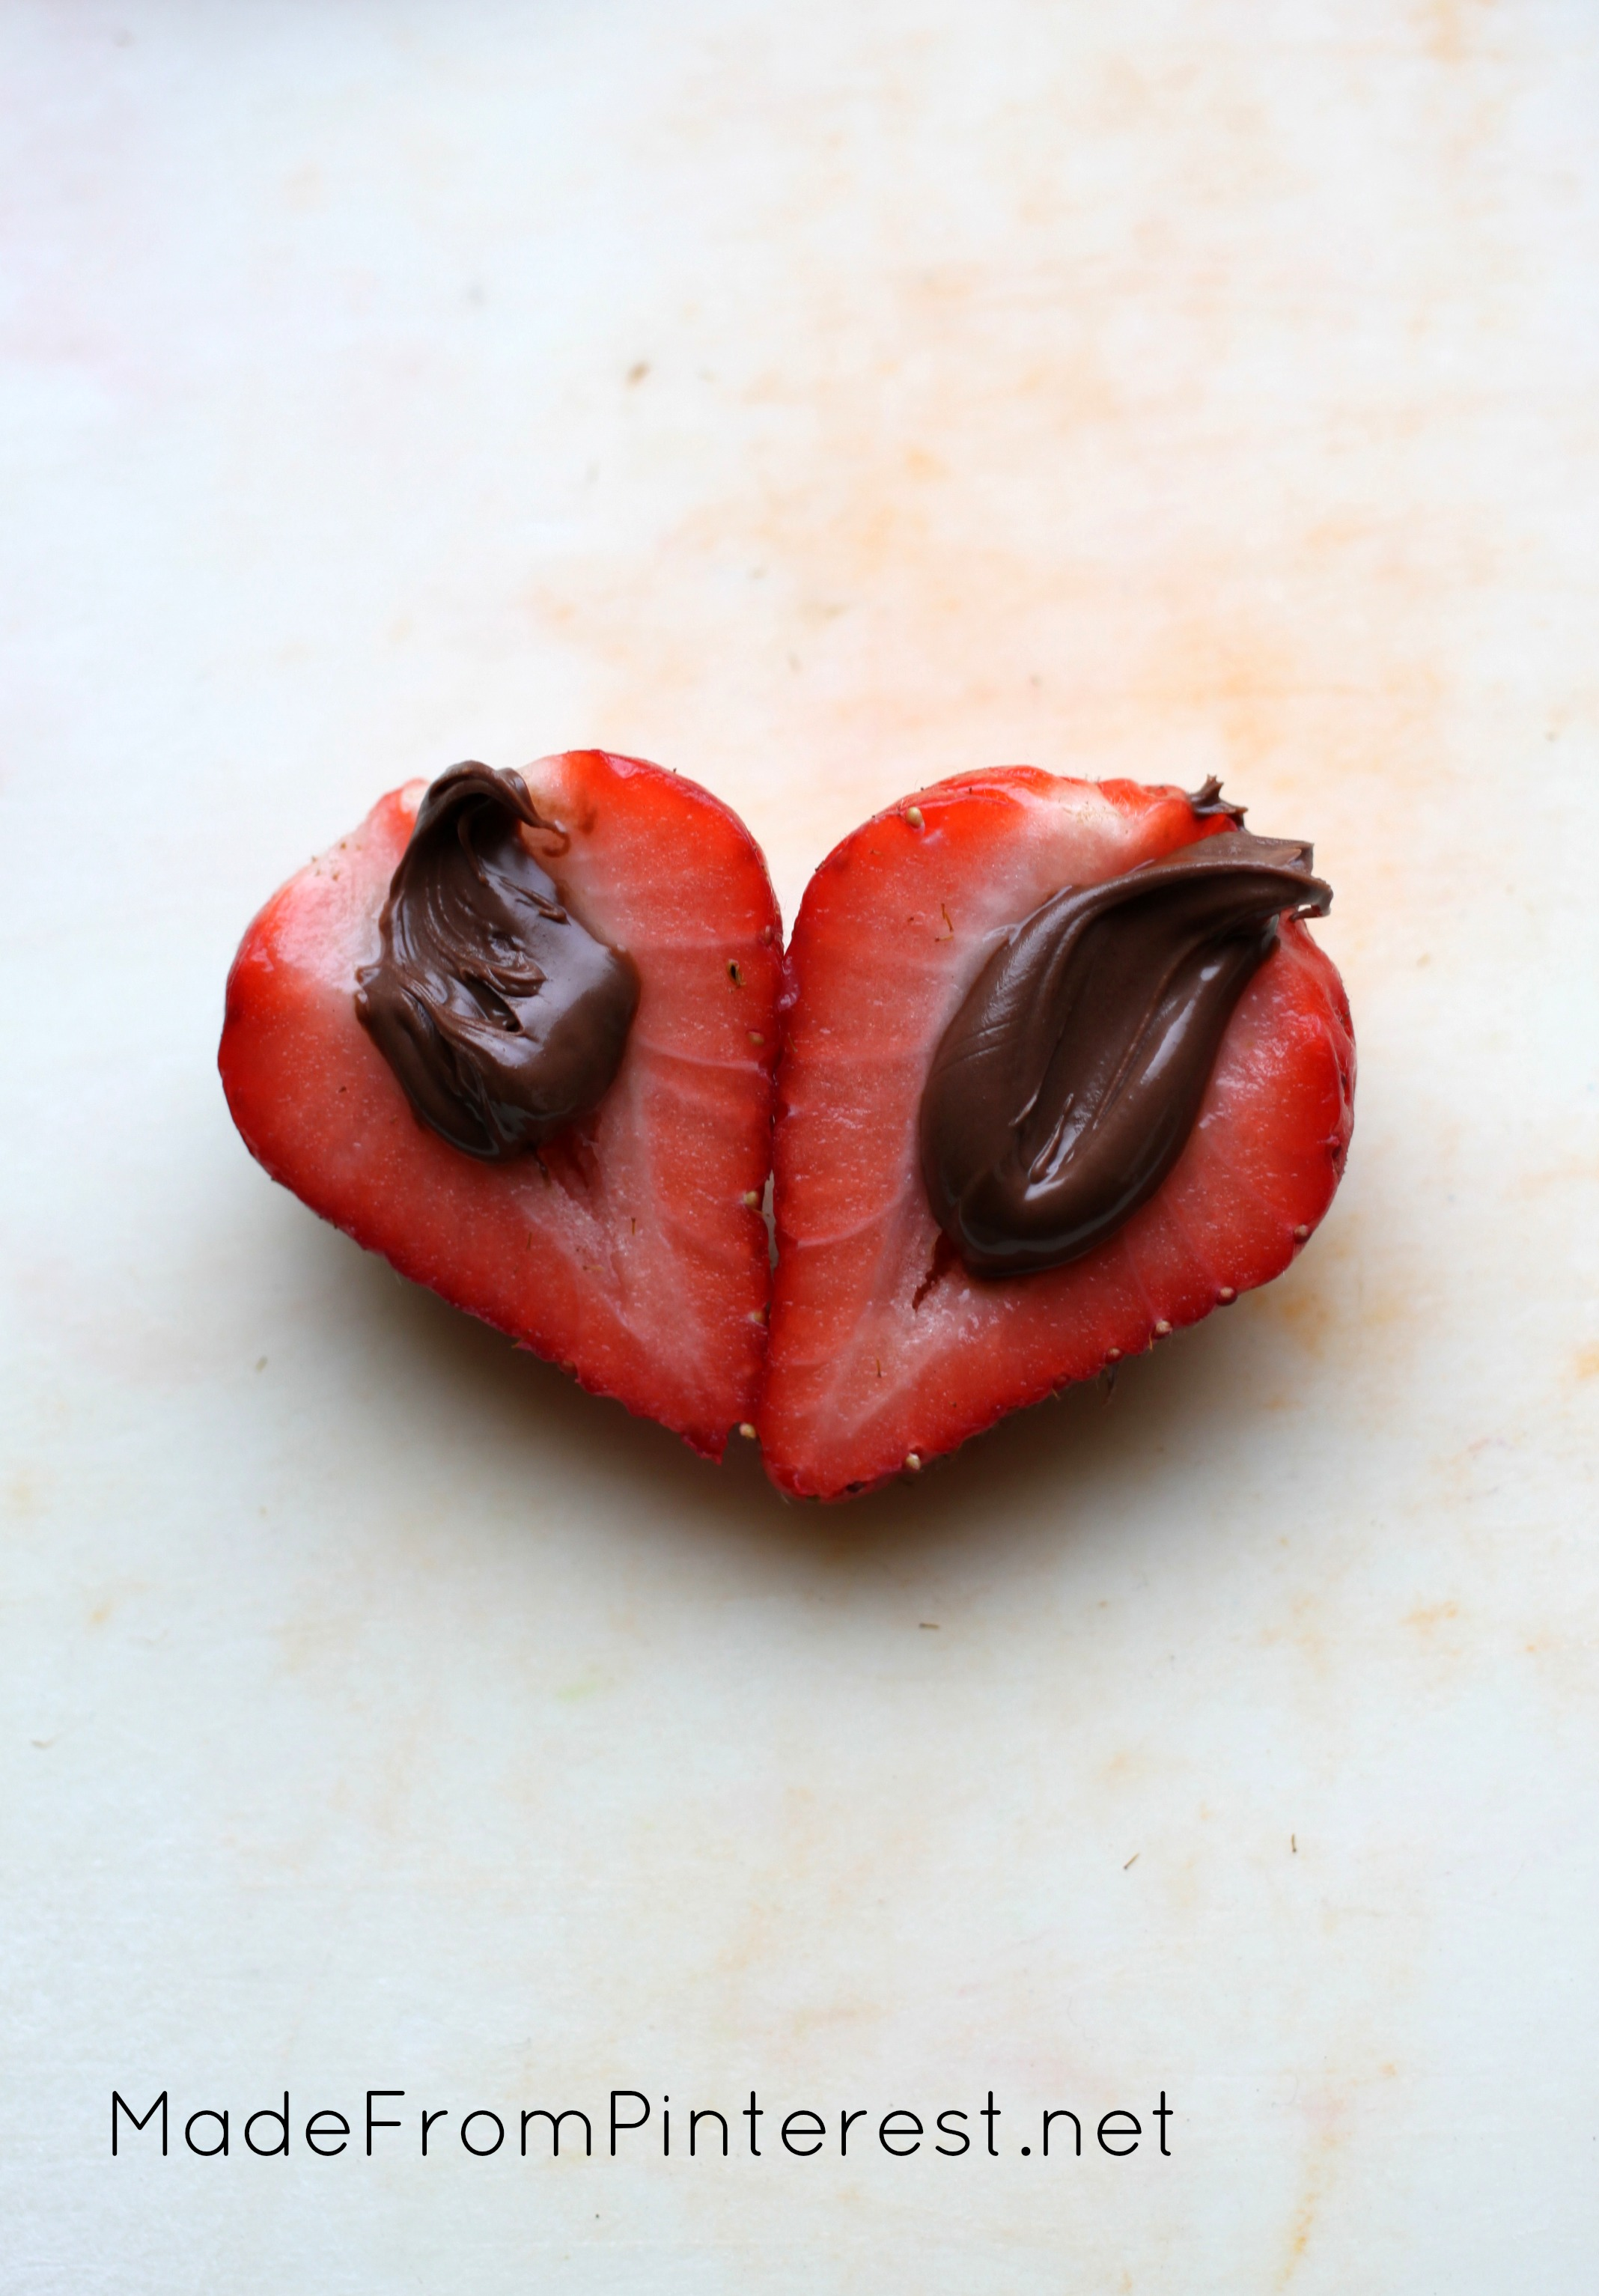 Heart Shaped Chocolate Strawberries - TGIF - This Grandma is Fun